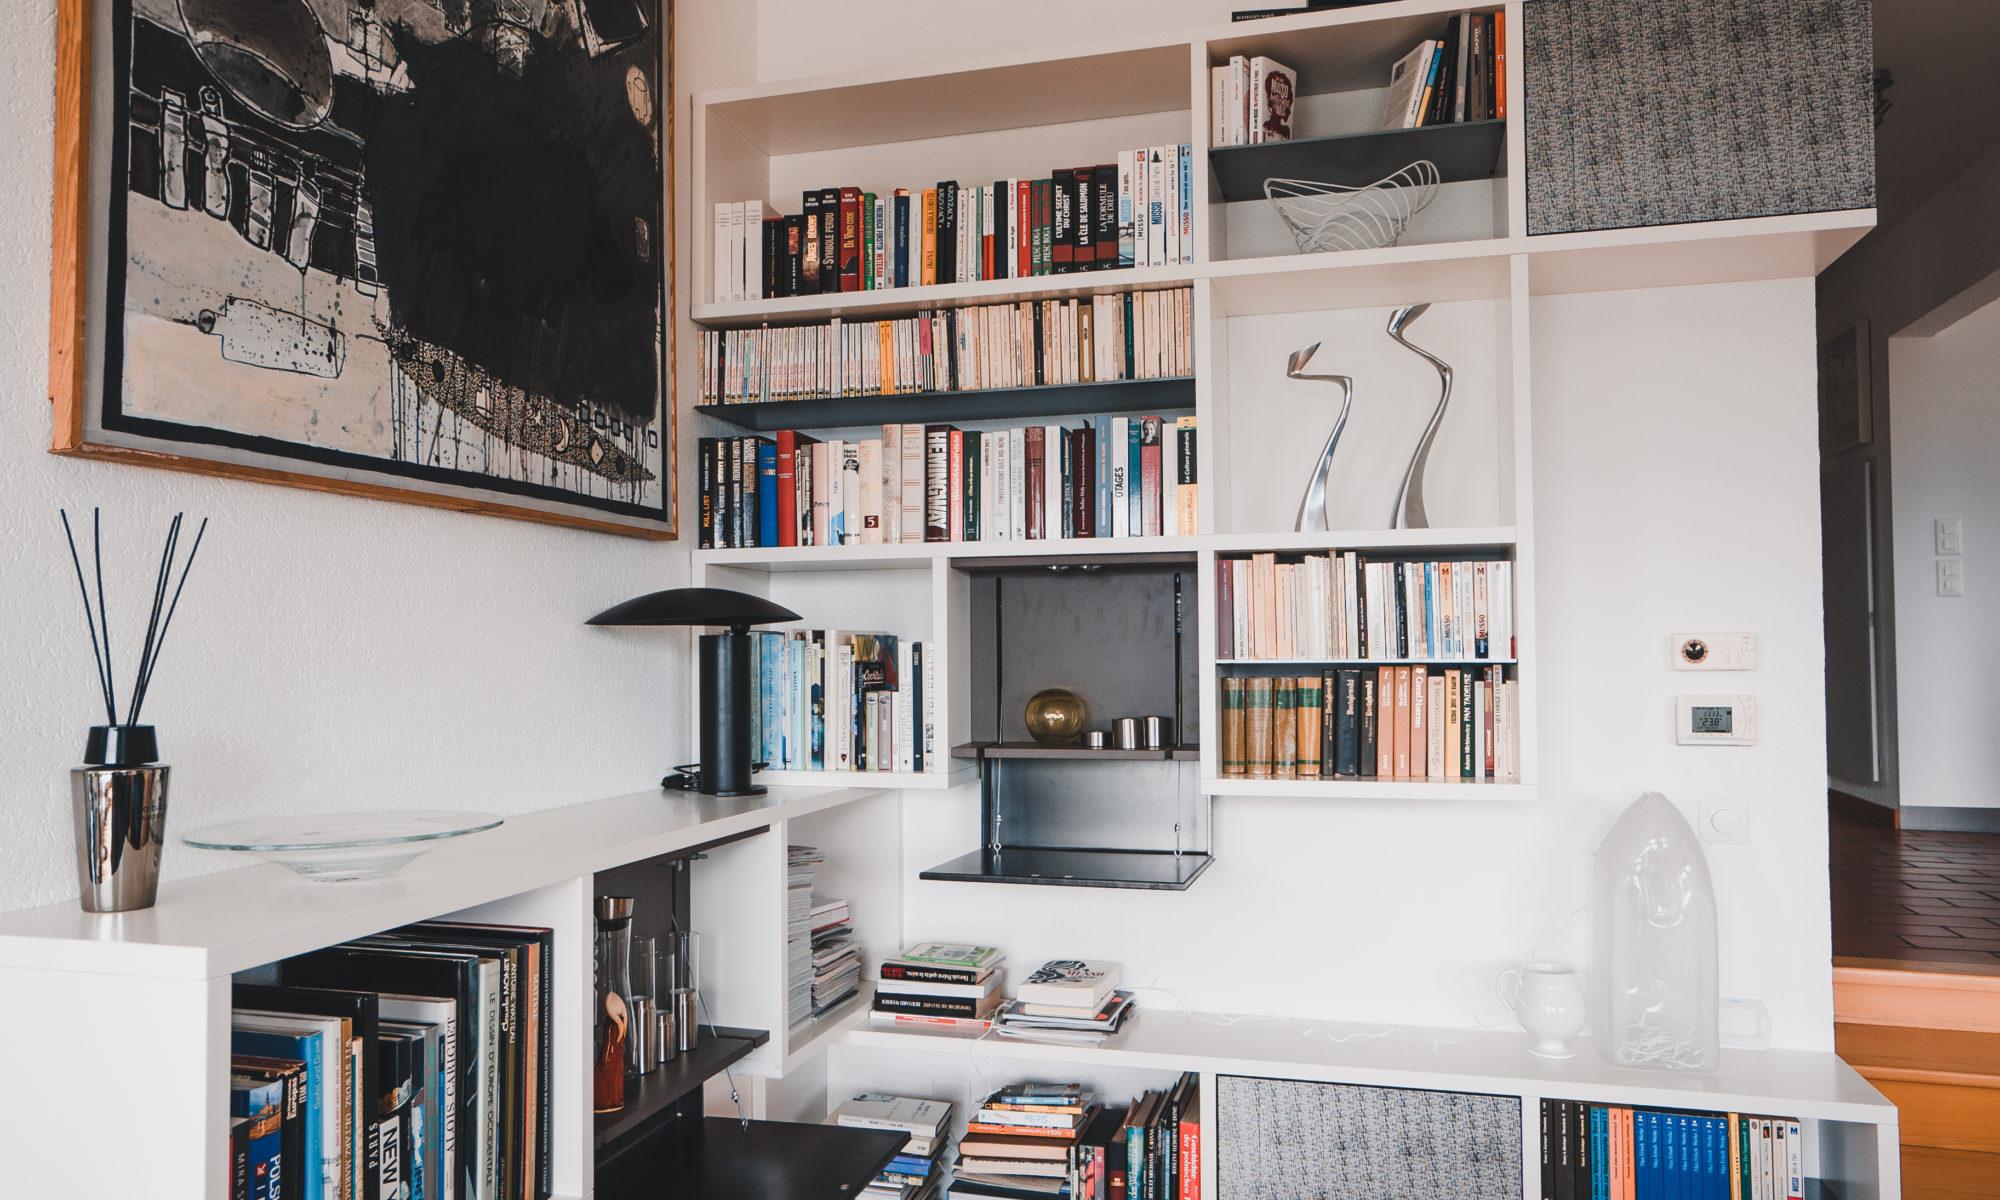 IMG 20190424 101218 2000x1200 - Bibliothèque salon